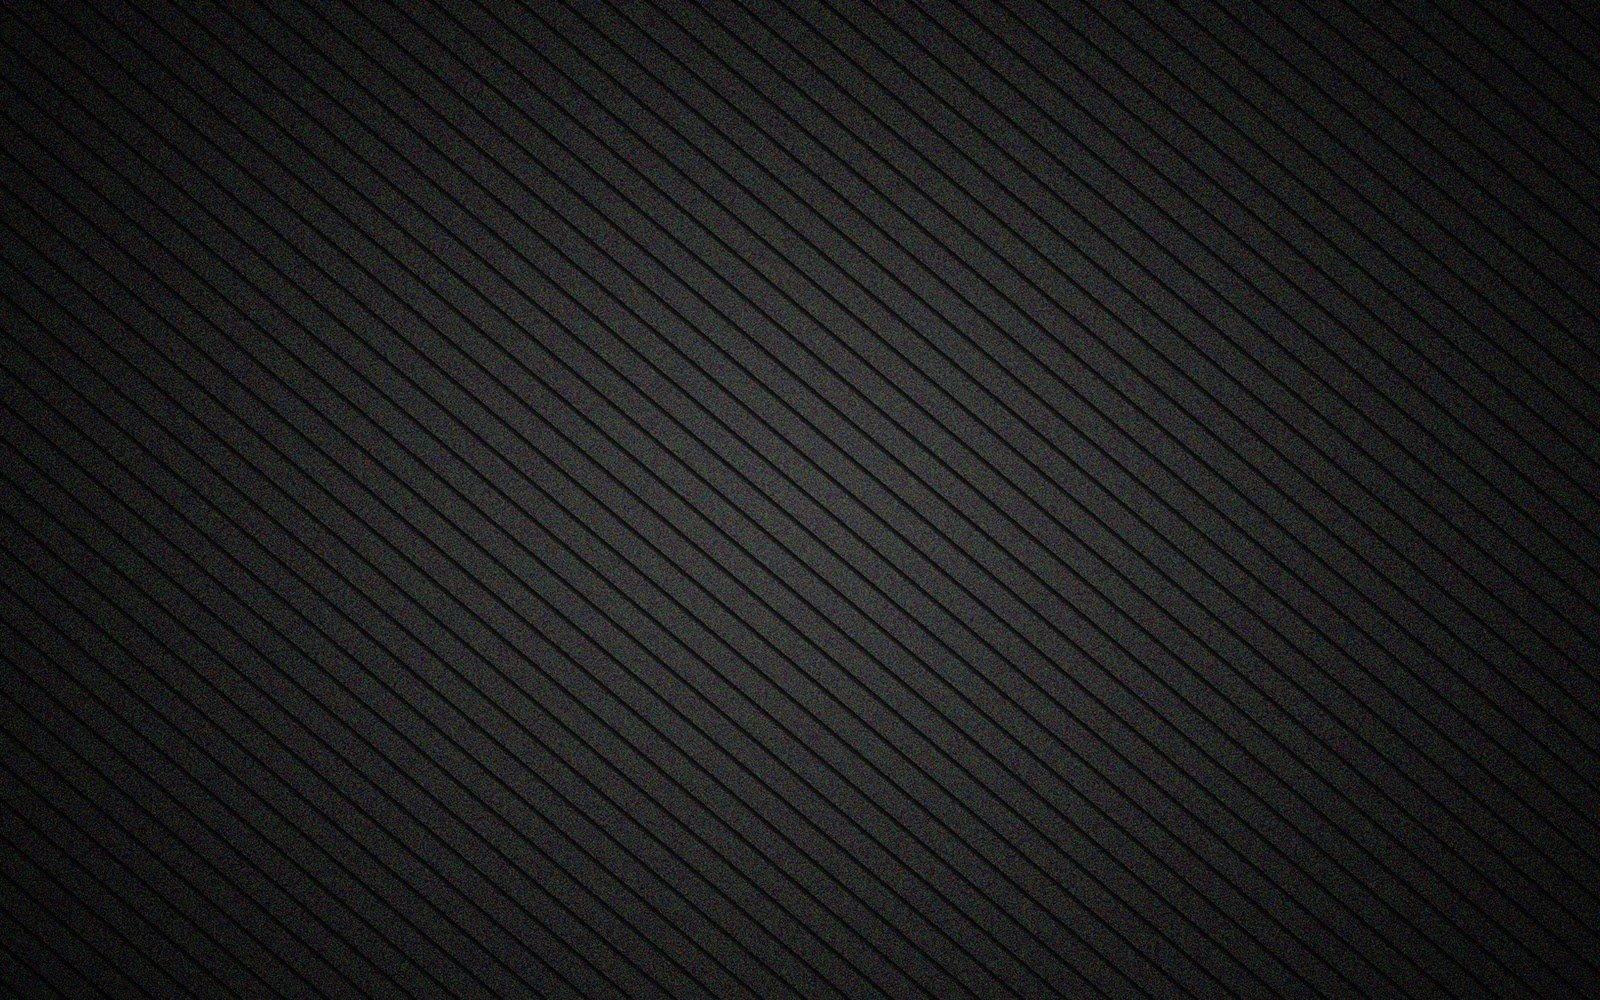 Hd Desktop Wallpaper Hd Dark Black Wallpapers Dark Acnovo